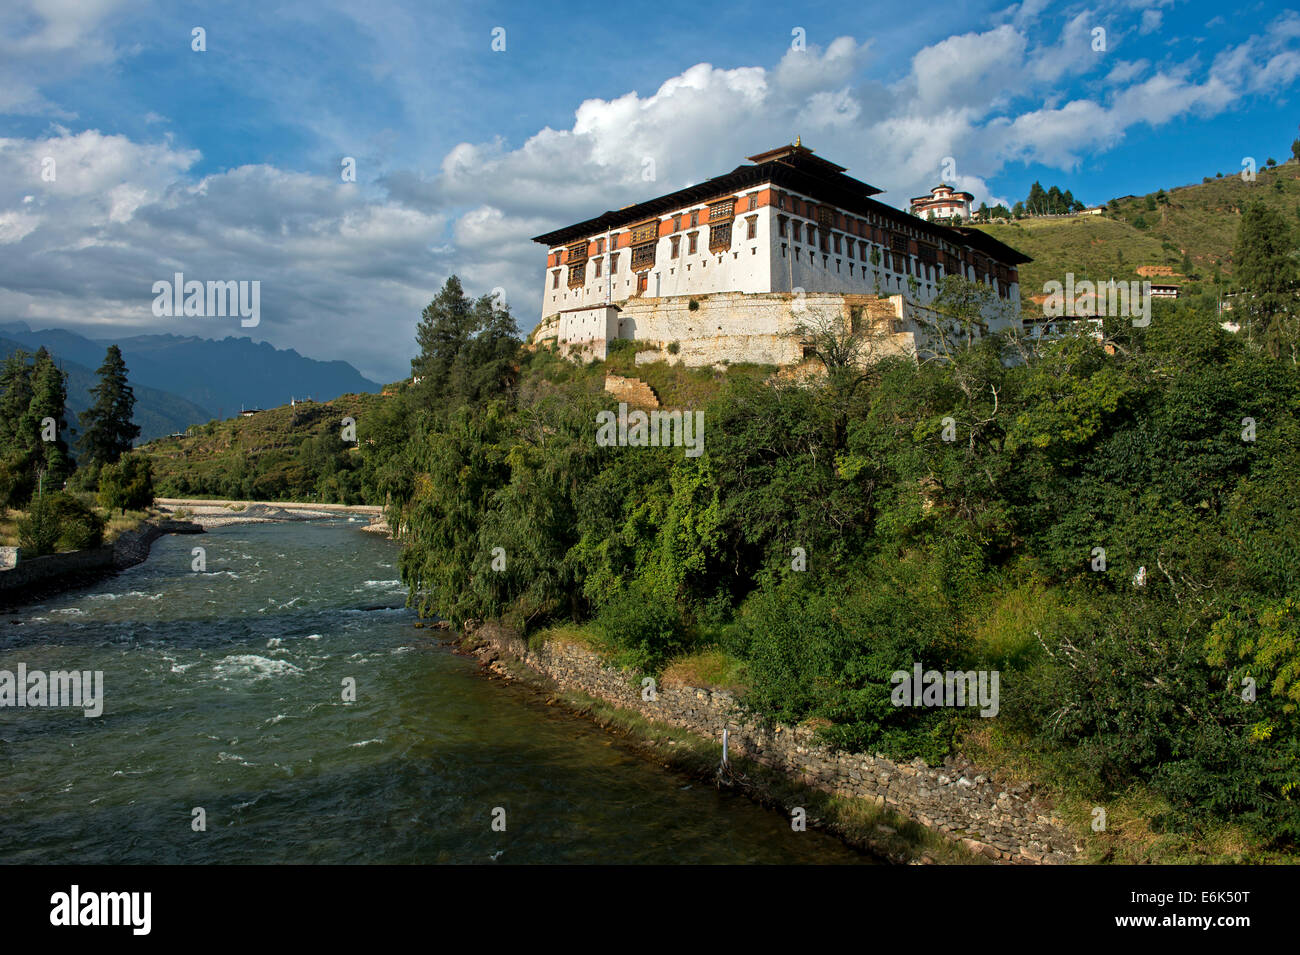 Rinpung Dzong, Drukpa Kagyu, Buddhist monastery and fortress, Paro district, Bhutan - Stock Image